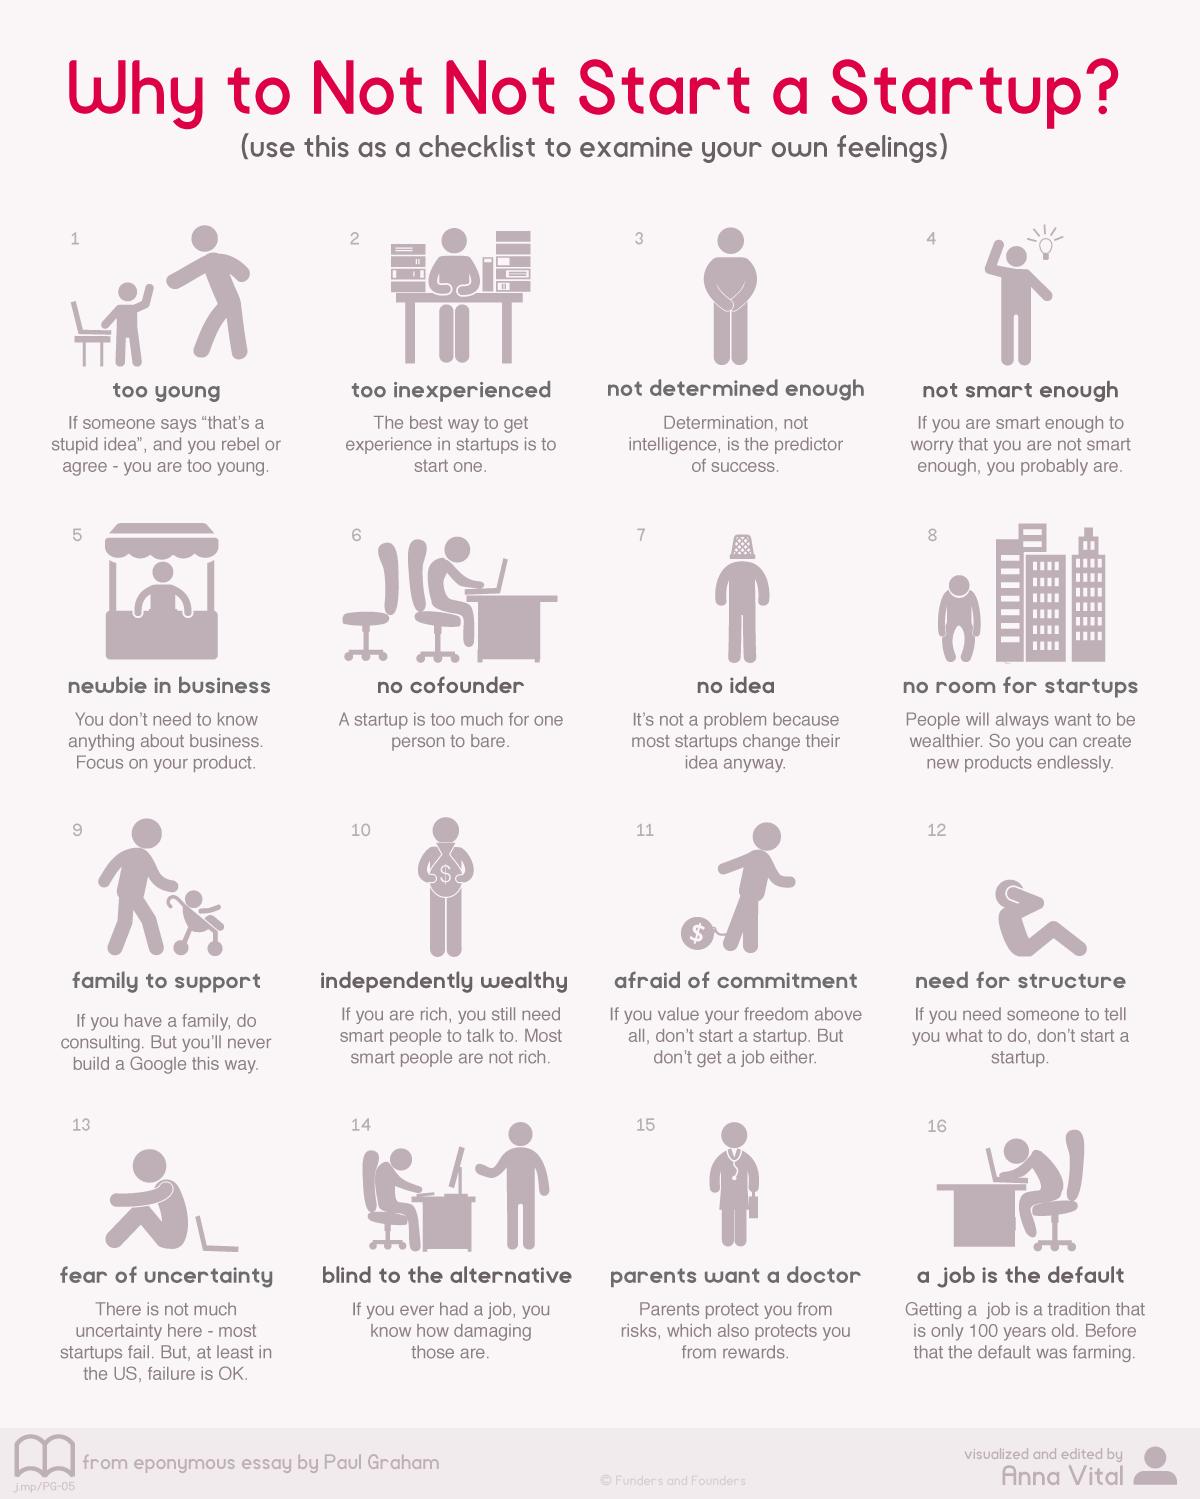 16 motivi sbagliati per avviare una startup